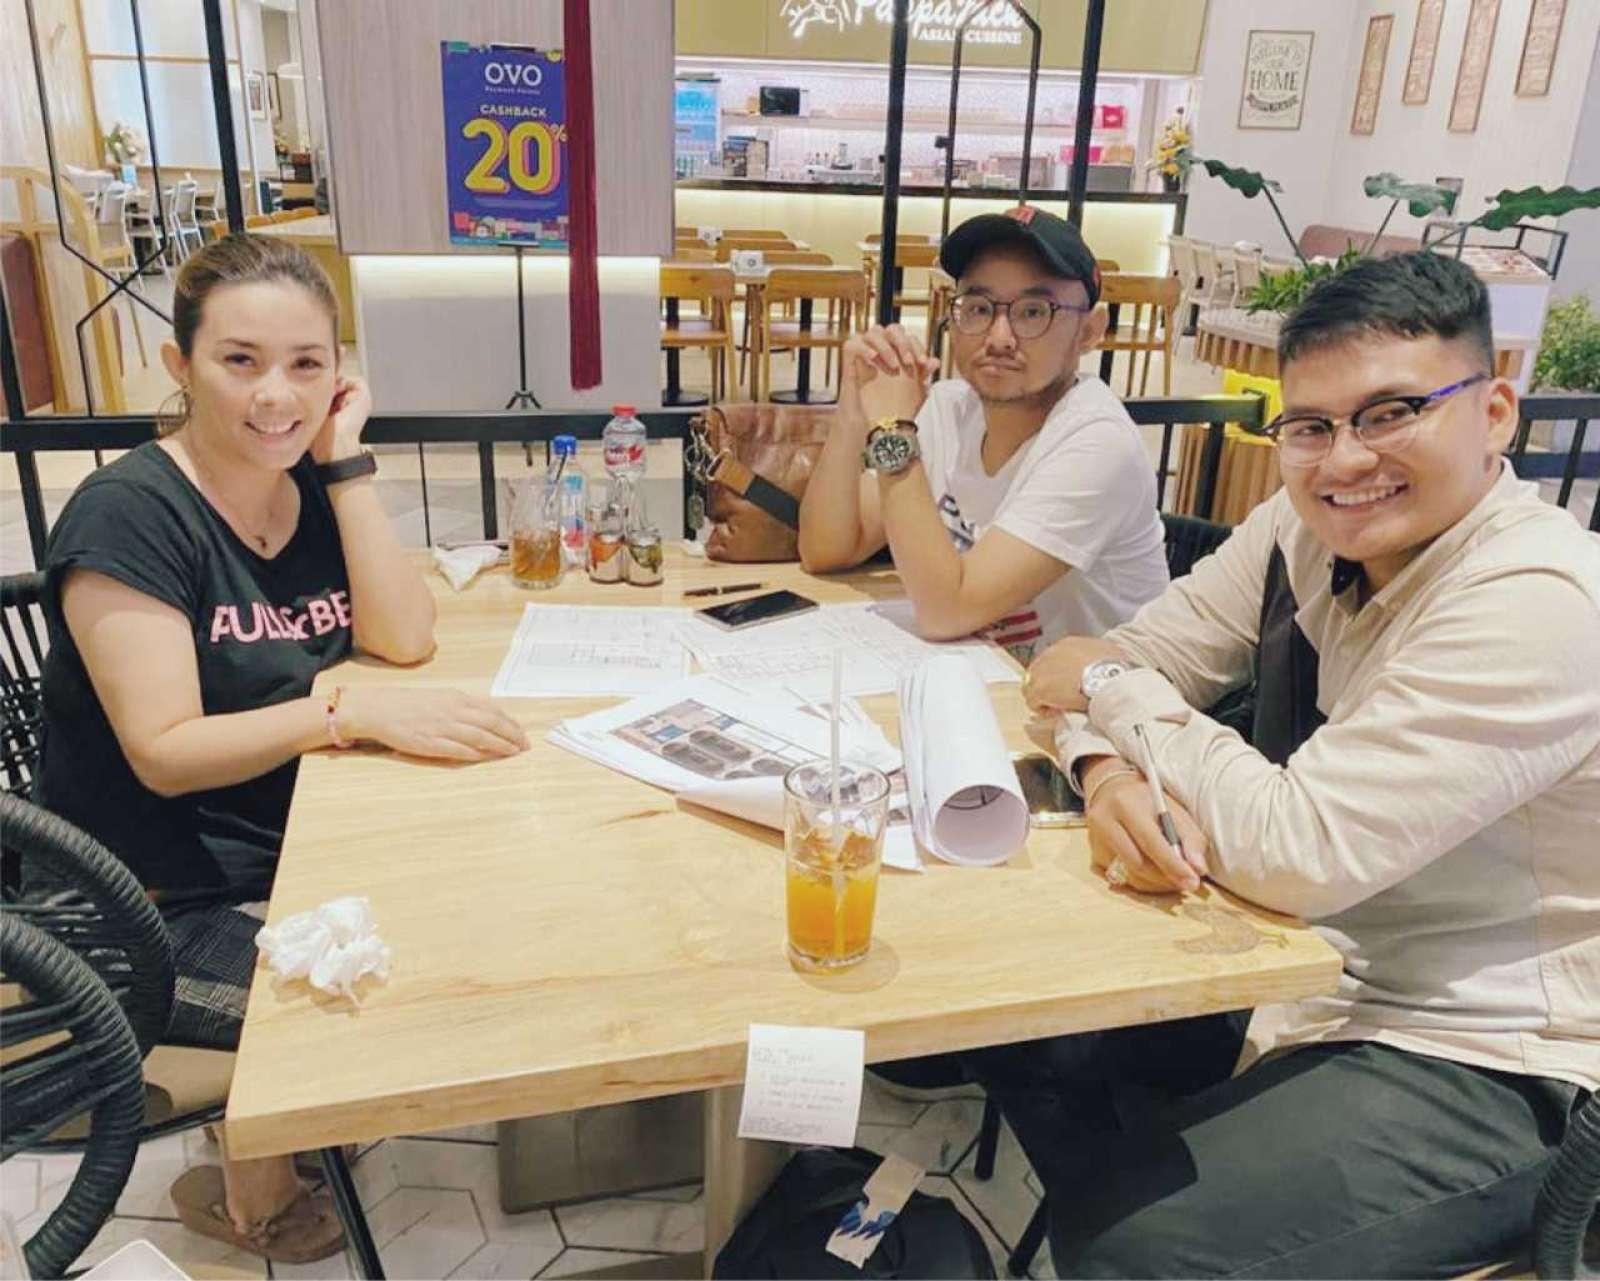 The results of a meeting with Mr Angga in Surabaya 1